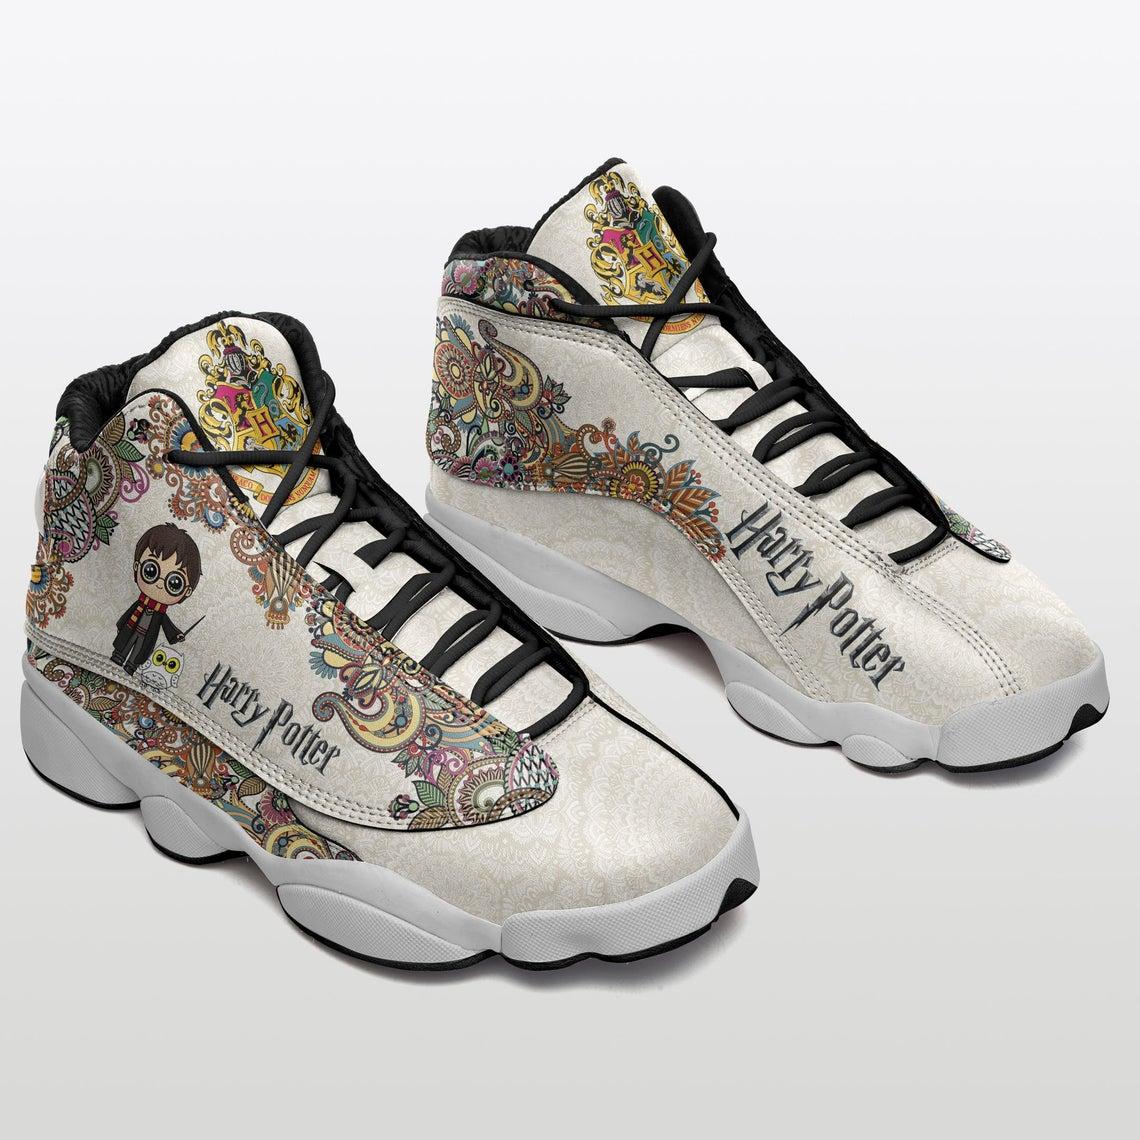 Harry Potter Gift For Fan Custom Sku 31 Air Jordan Shoes